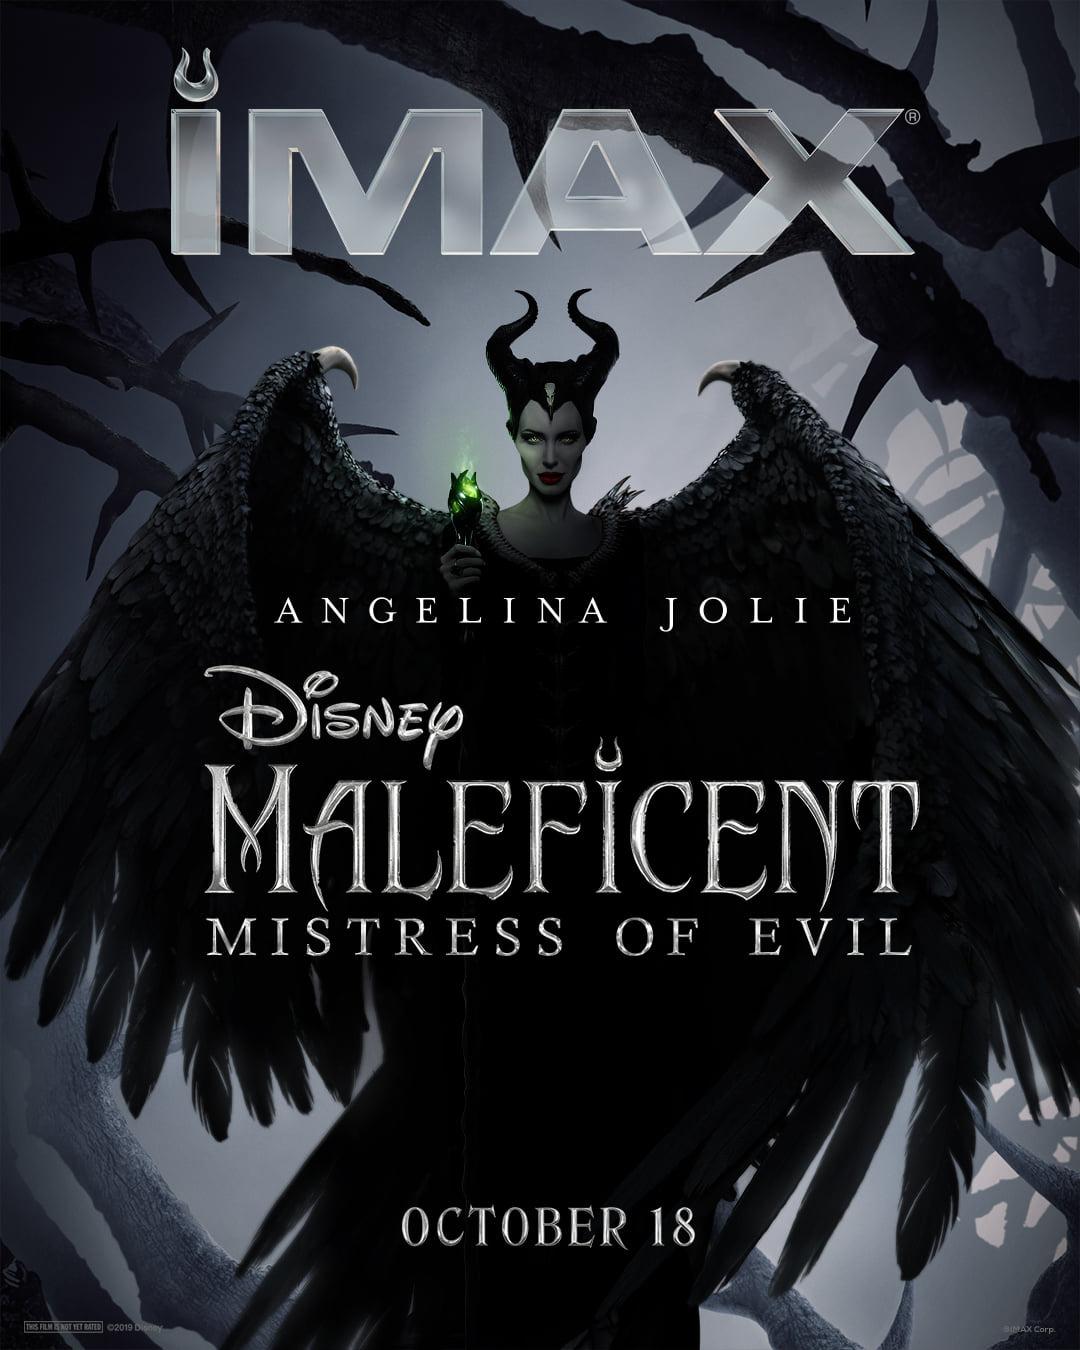 szmk_maleficent_mistress_of_evil_demona_disney_csipkerozsika_angelina_jolie_sotetseg_urnoje_2_9.jpg